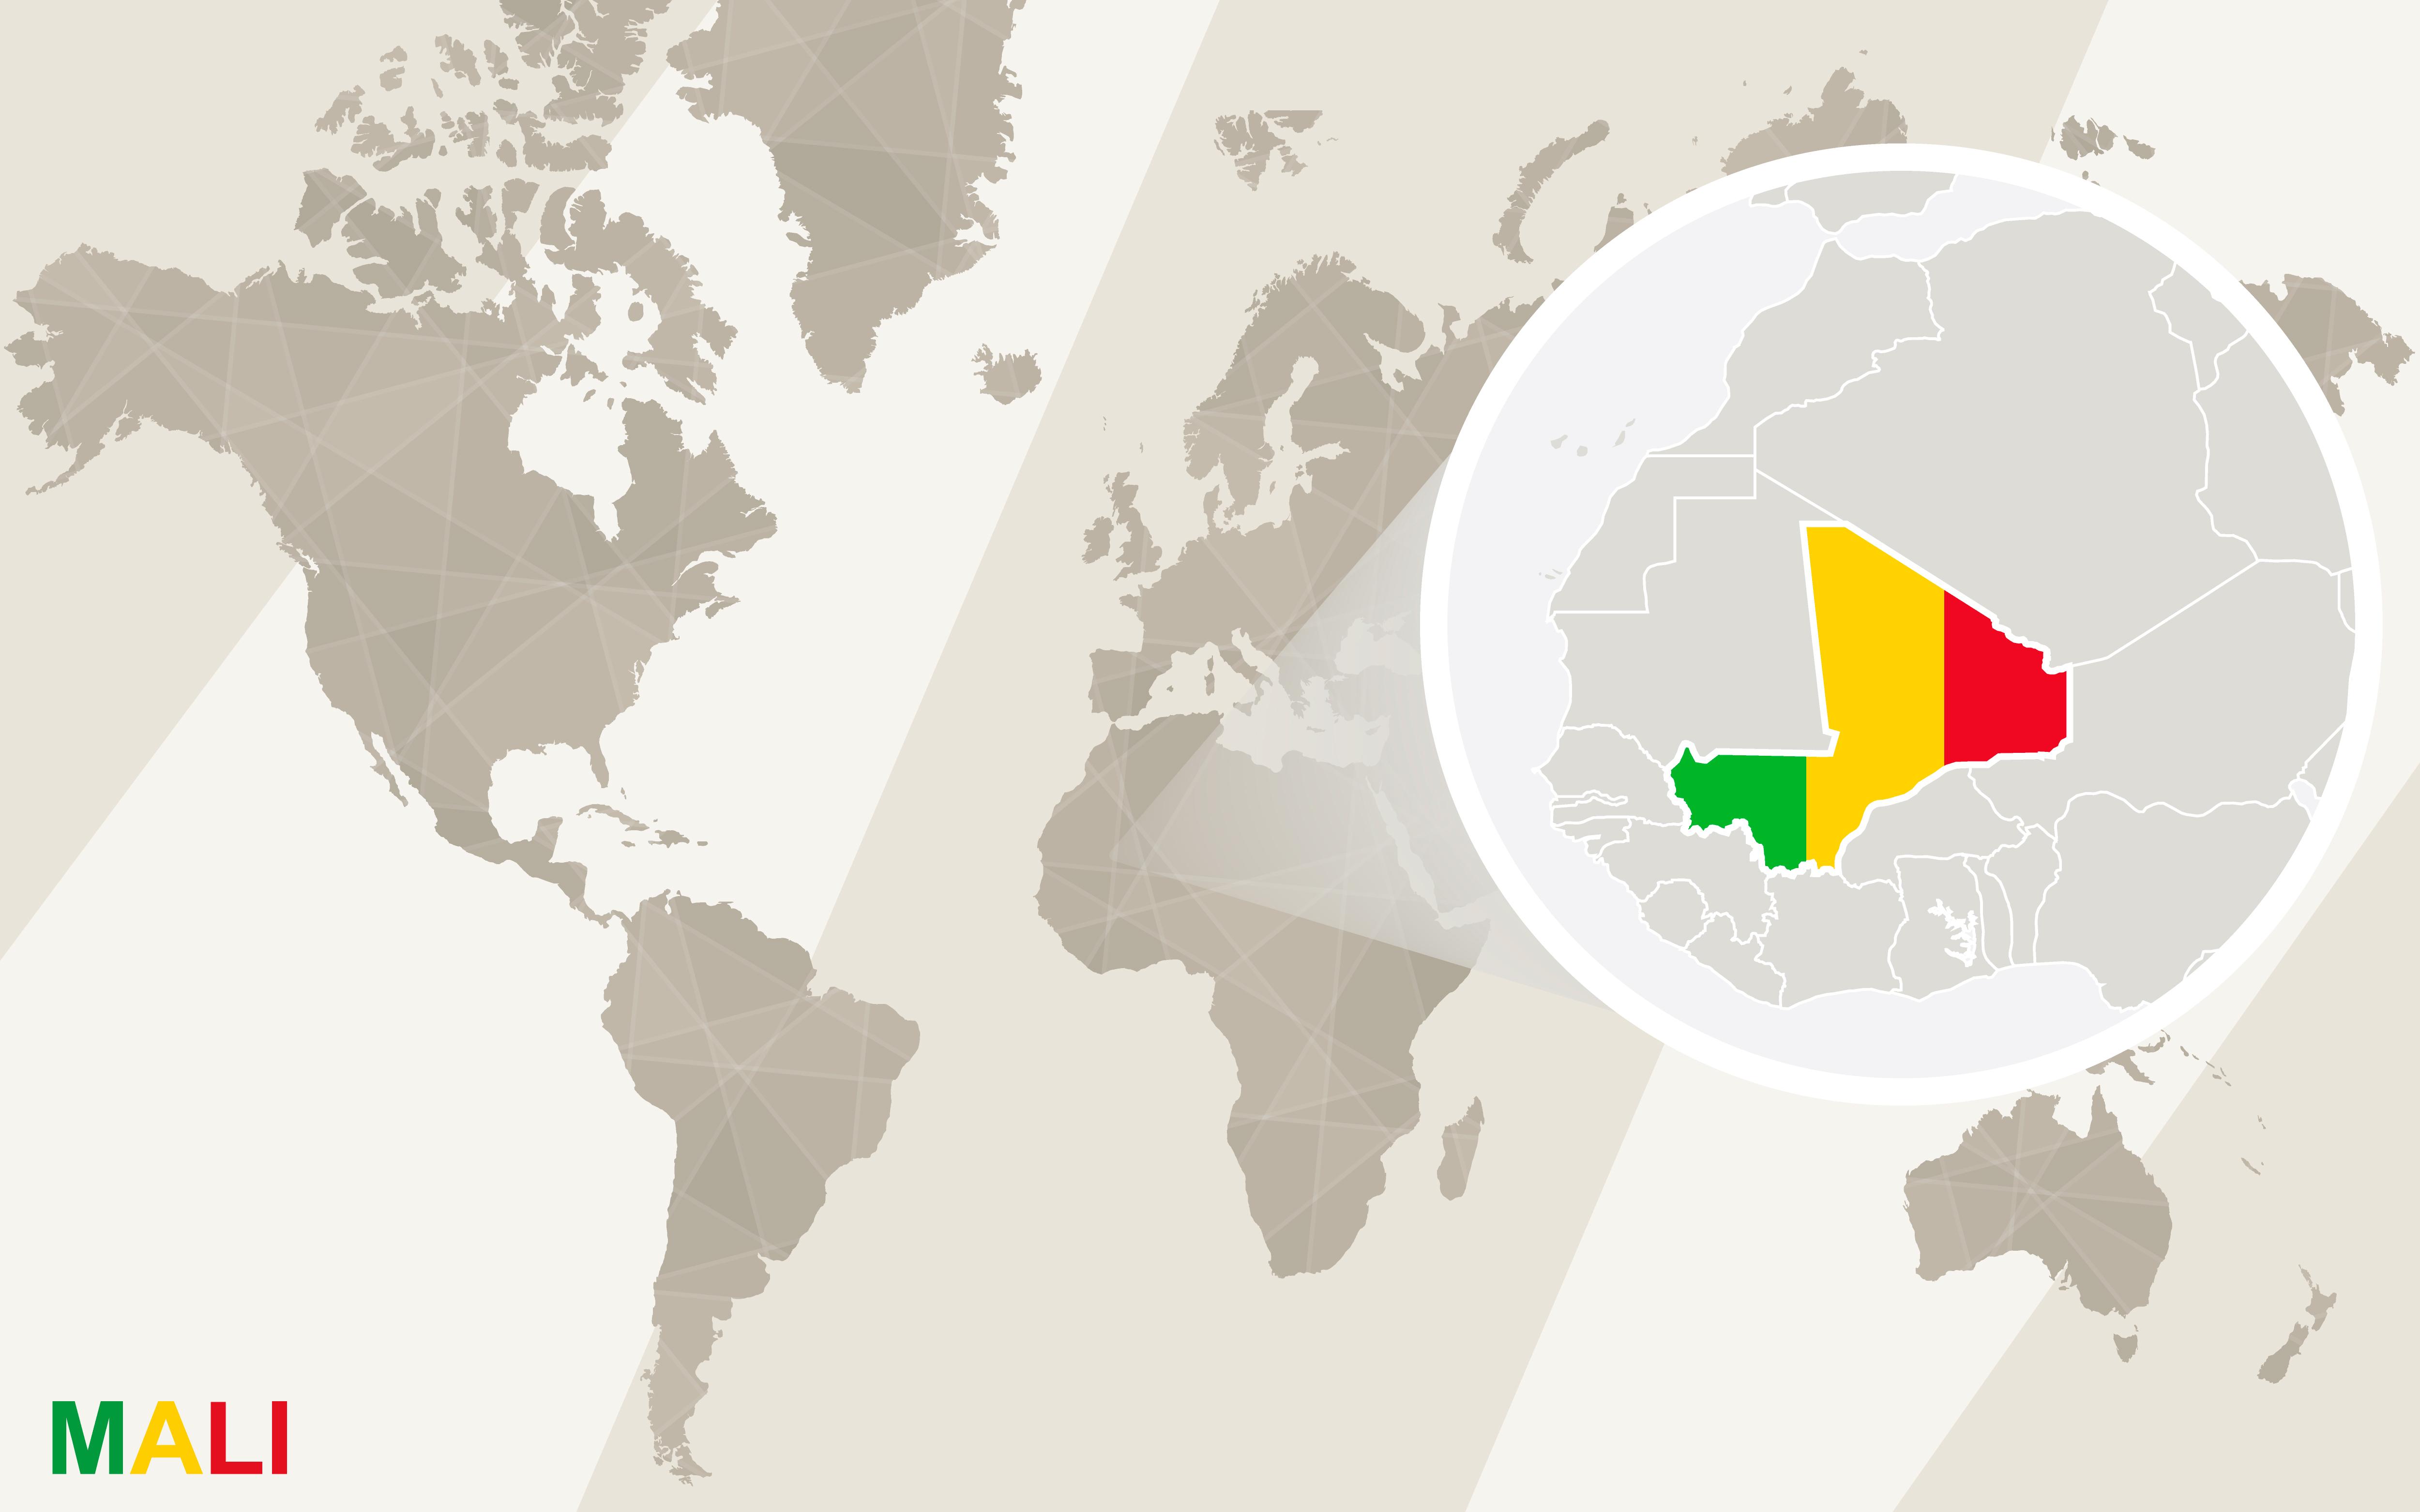 Location of Mali in western Africa. Image courtesy of DollarPhotoClub.